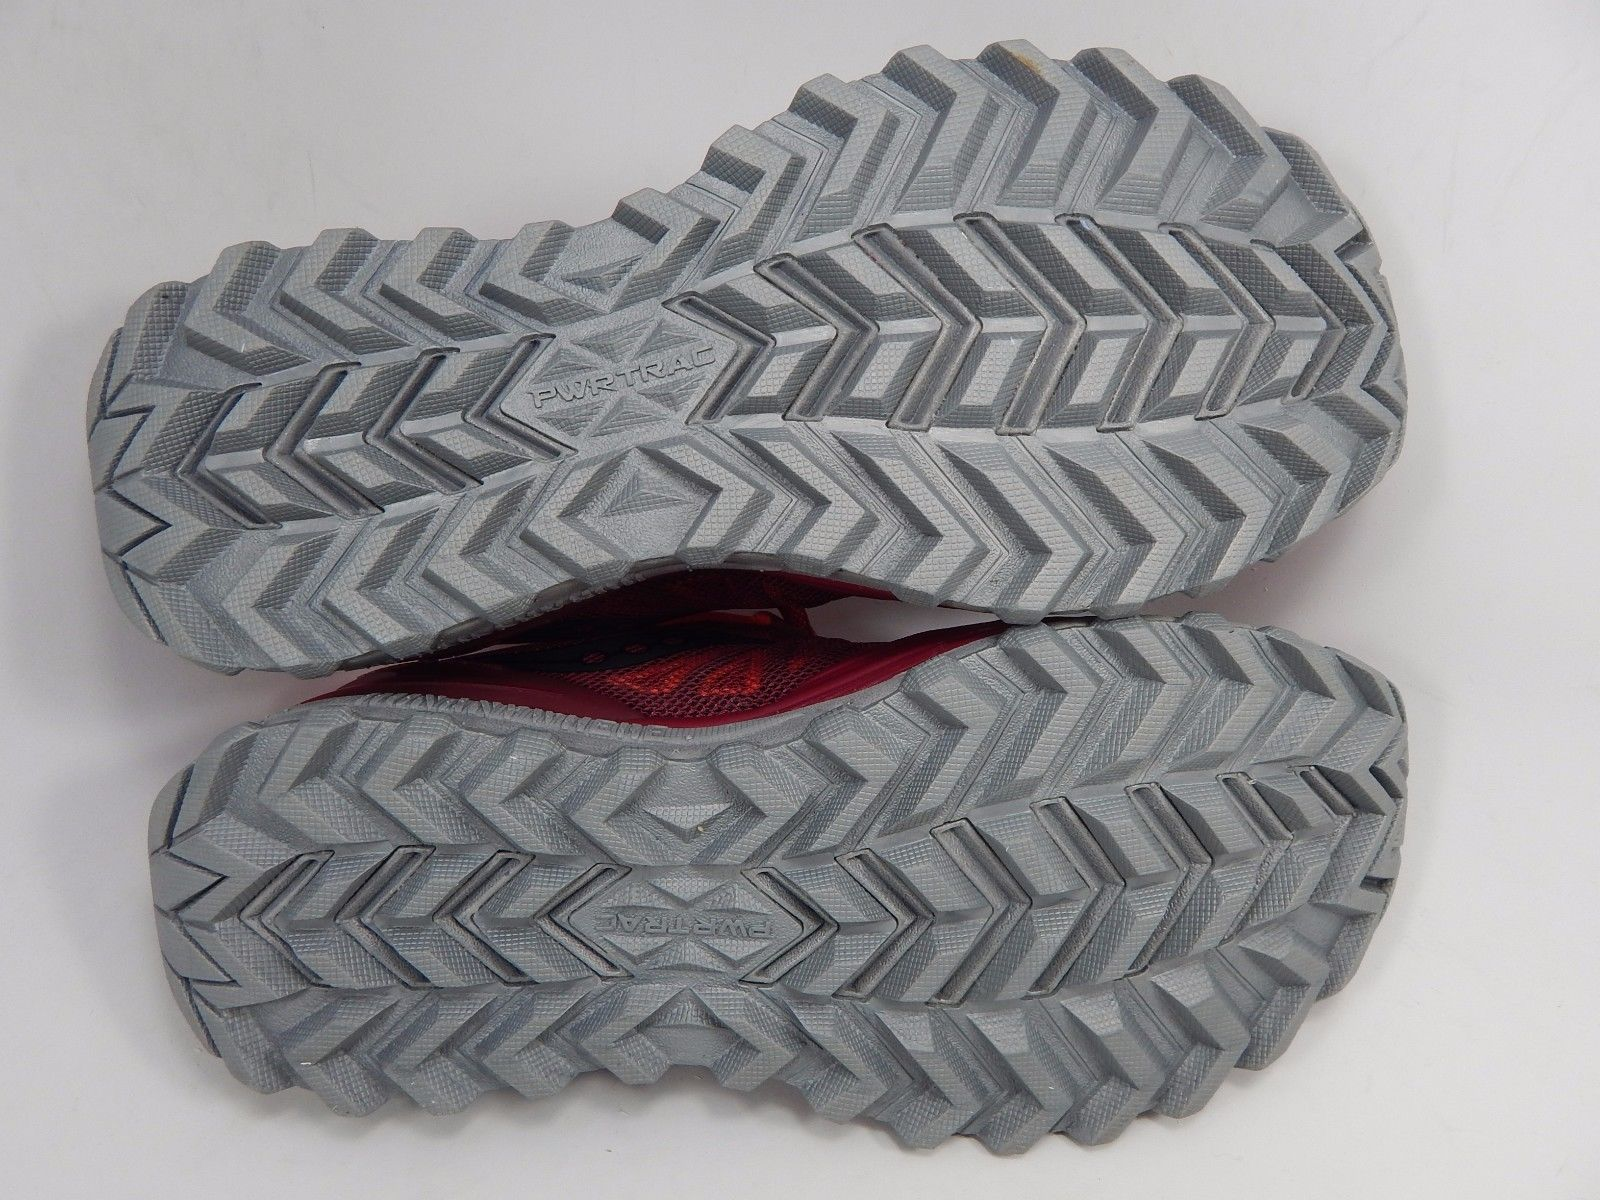 Saucony Xodus ISO 2 Women's Running Shoes Size US 8 M (B) EU 39 Berry S10387-1